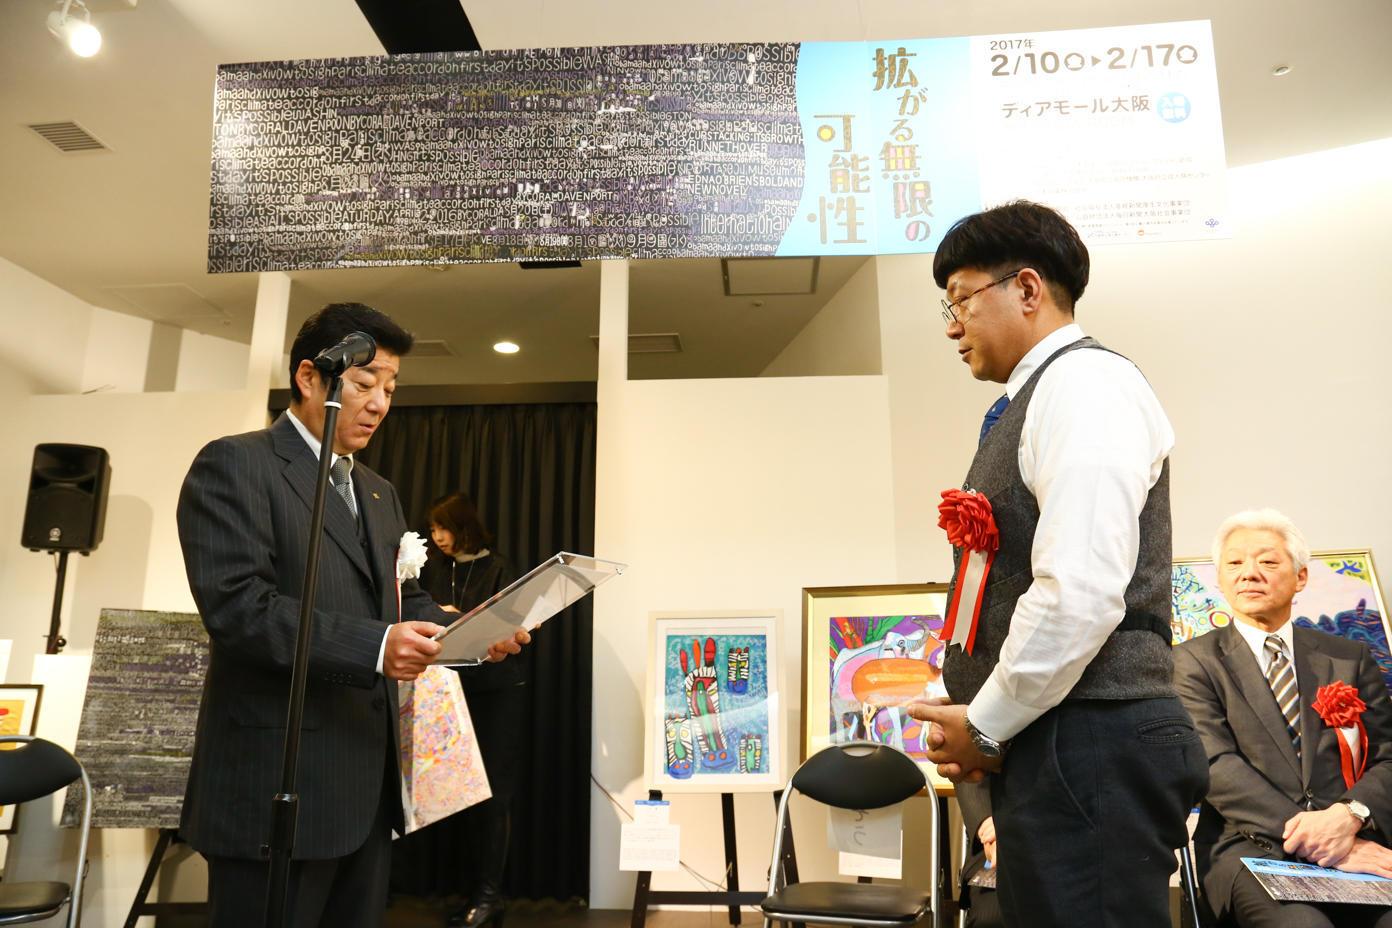 http://news.yoshimoto.co.jp/20170210155343-84c259c3d508669066ae14a3fc4c92fda3abdc6c.jpg